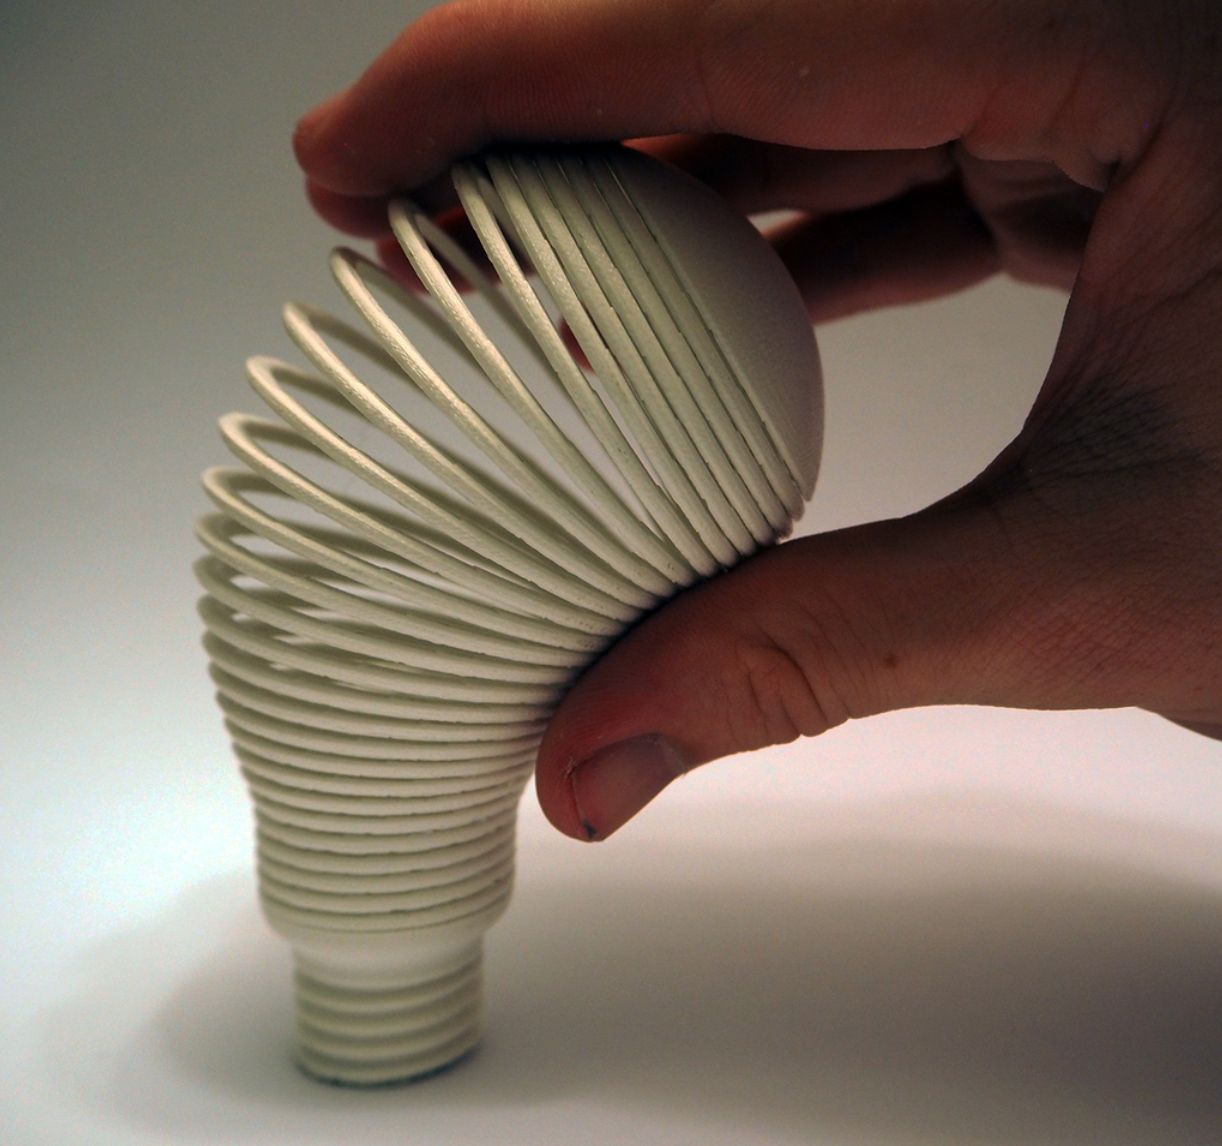 Capture d'écran 2017-11-06 à 09.24.52.png Download free STL file Light Bulb Sculpture 2 (Springo) • 3D printing object, Toomblercazz